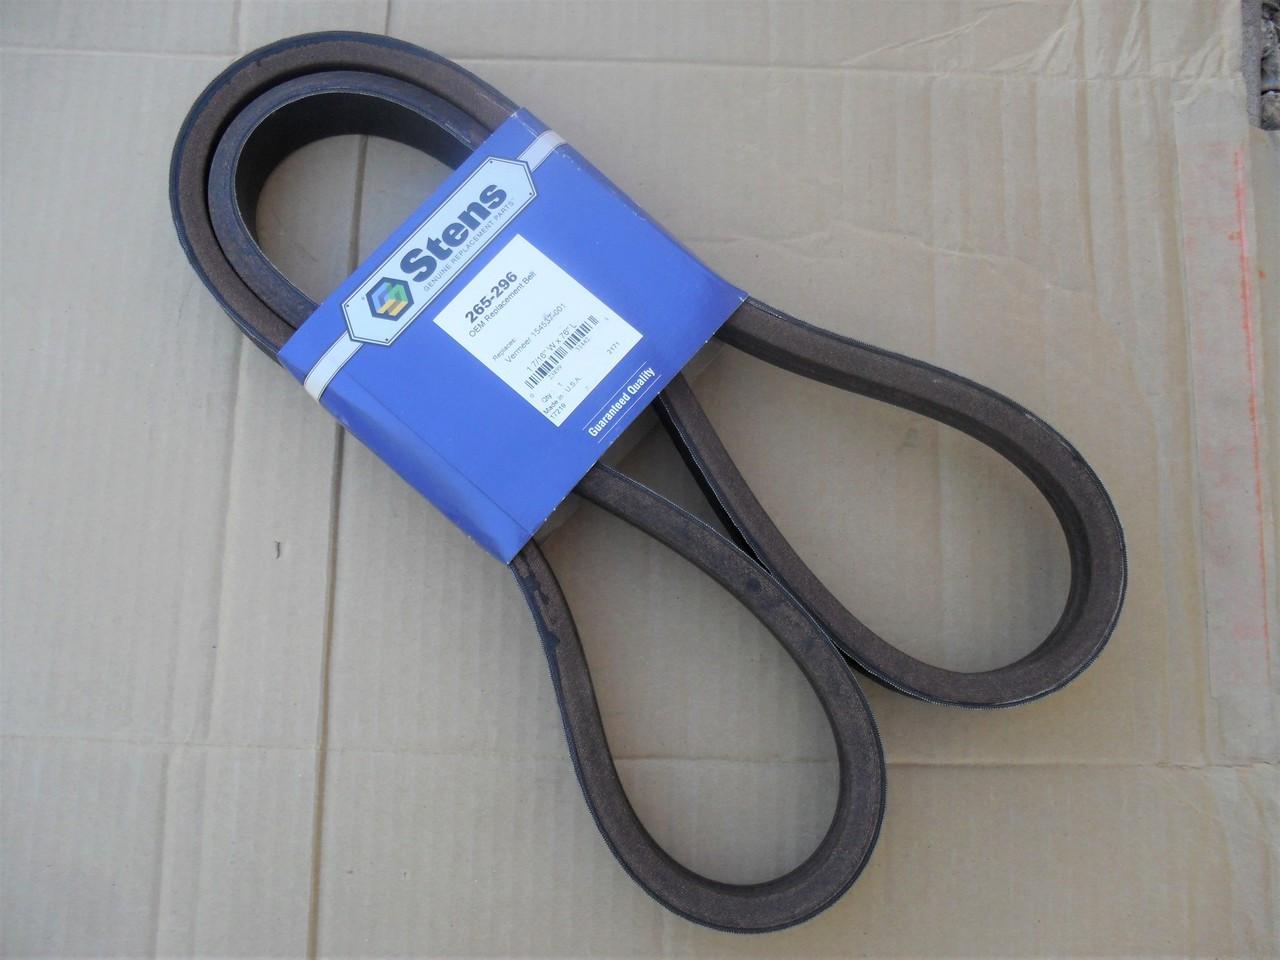 Drive Belt for Vermeer BC600XL Chipper Shredder 154537001, 154537-001, Made  In USA